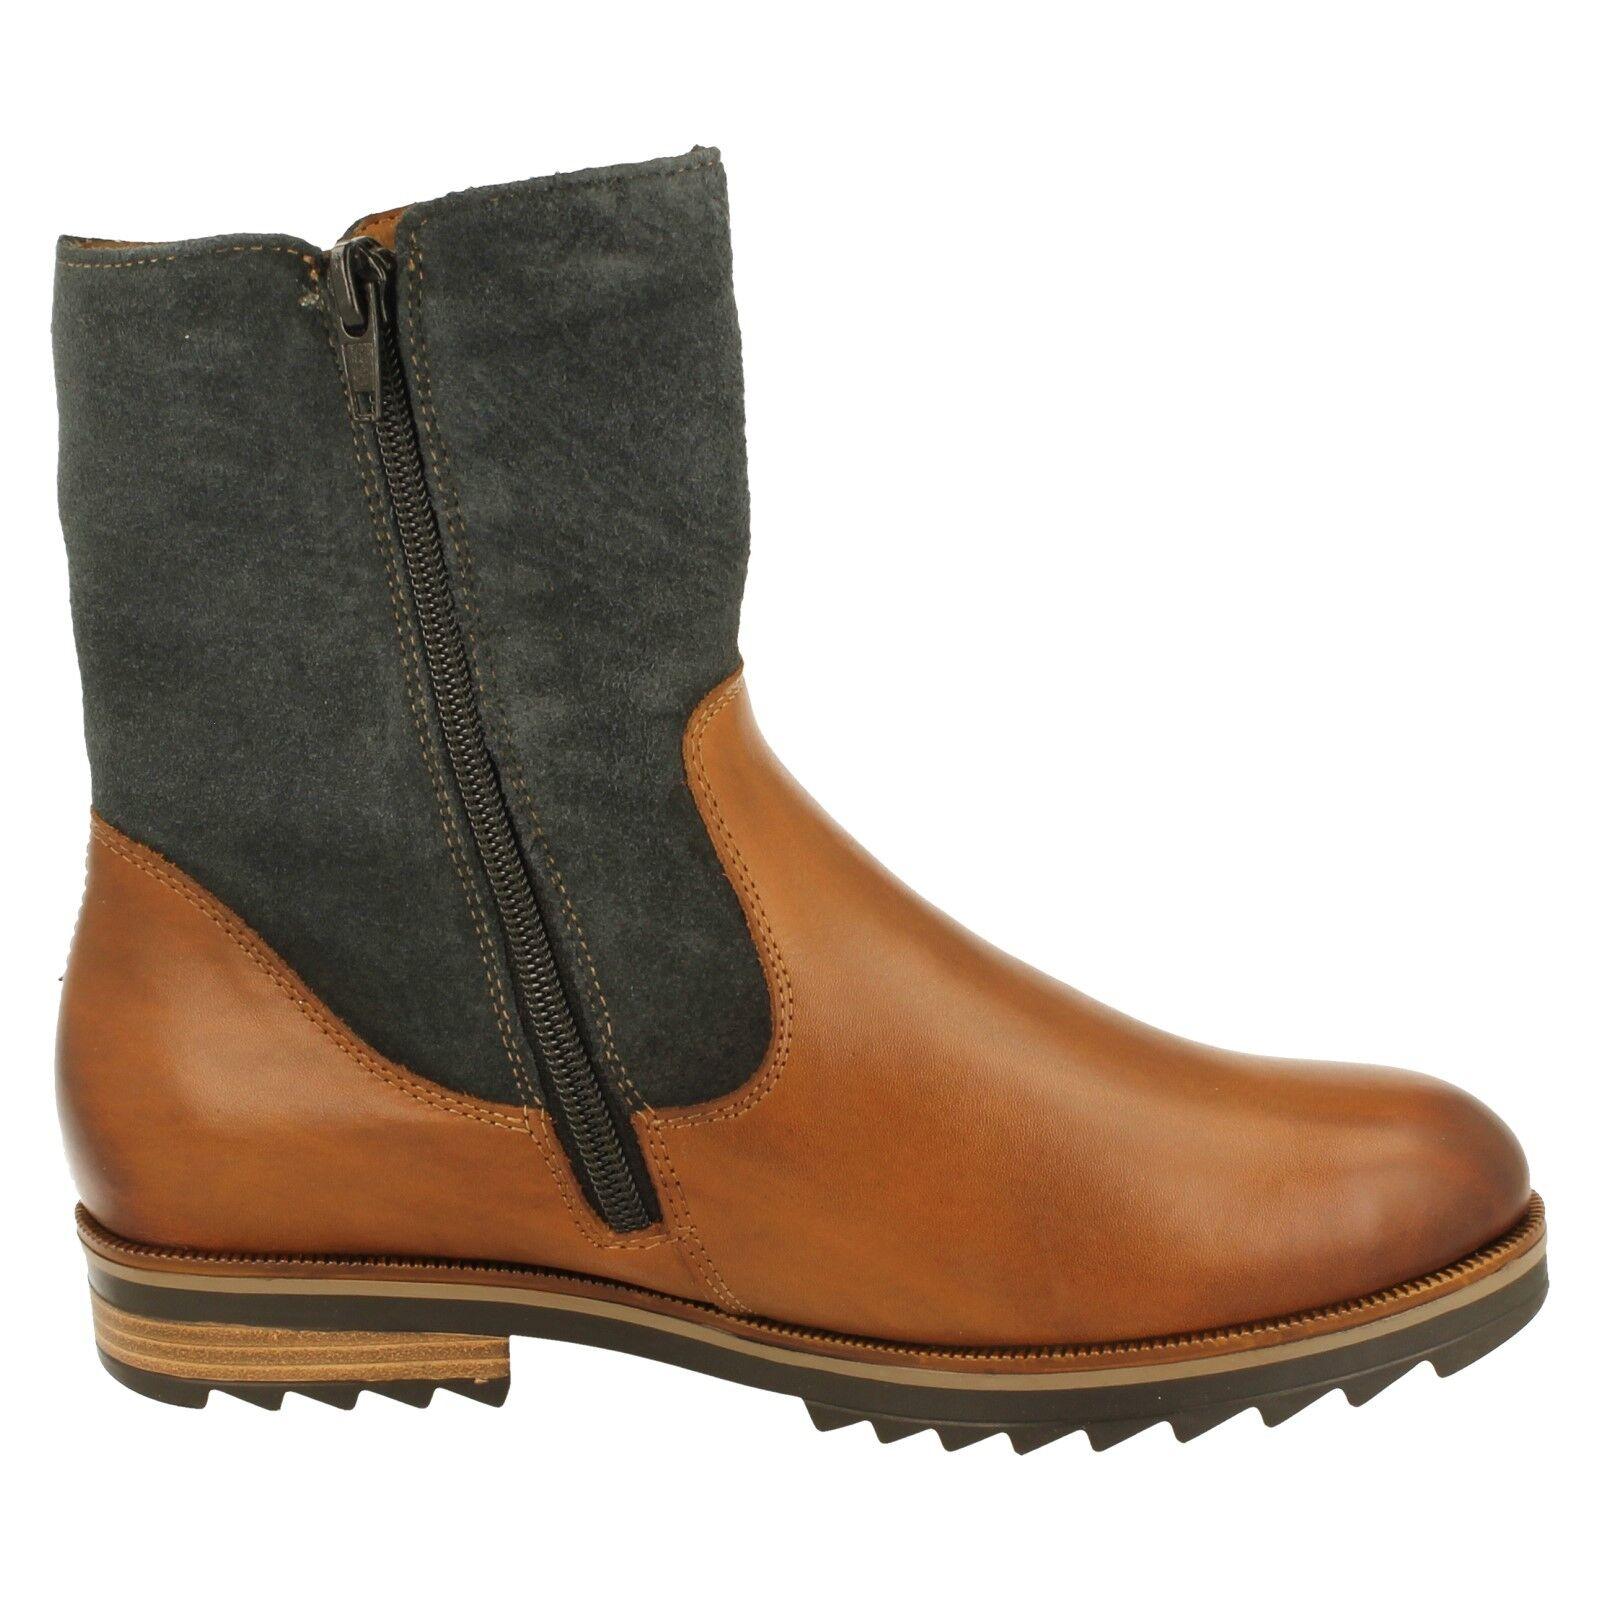 Ladies R2290 Remonte Fleece Lined Ankle Boots - R2290 Ladies 6c1979